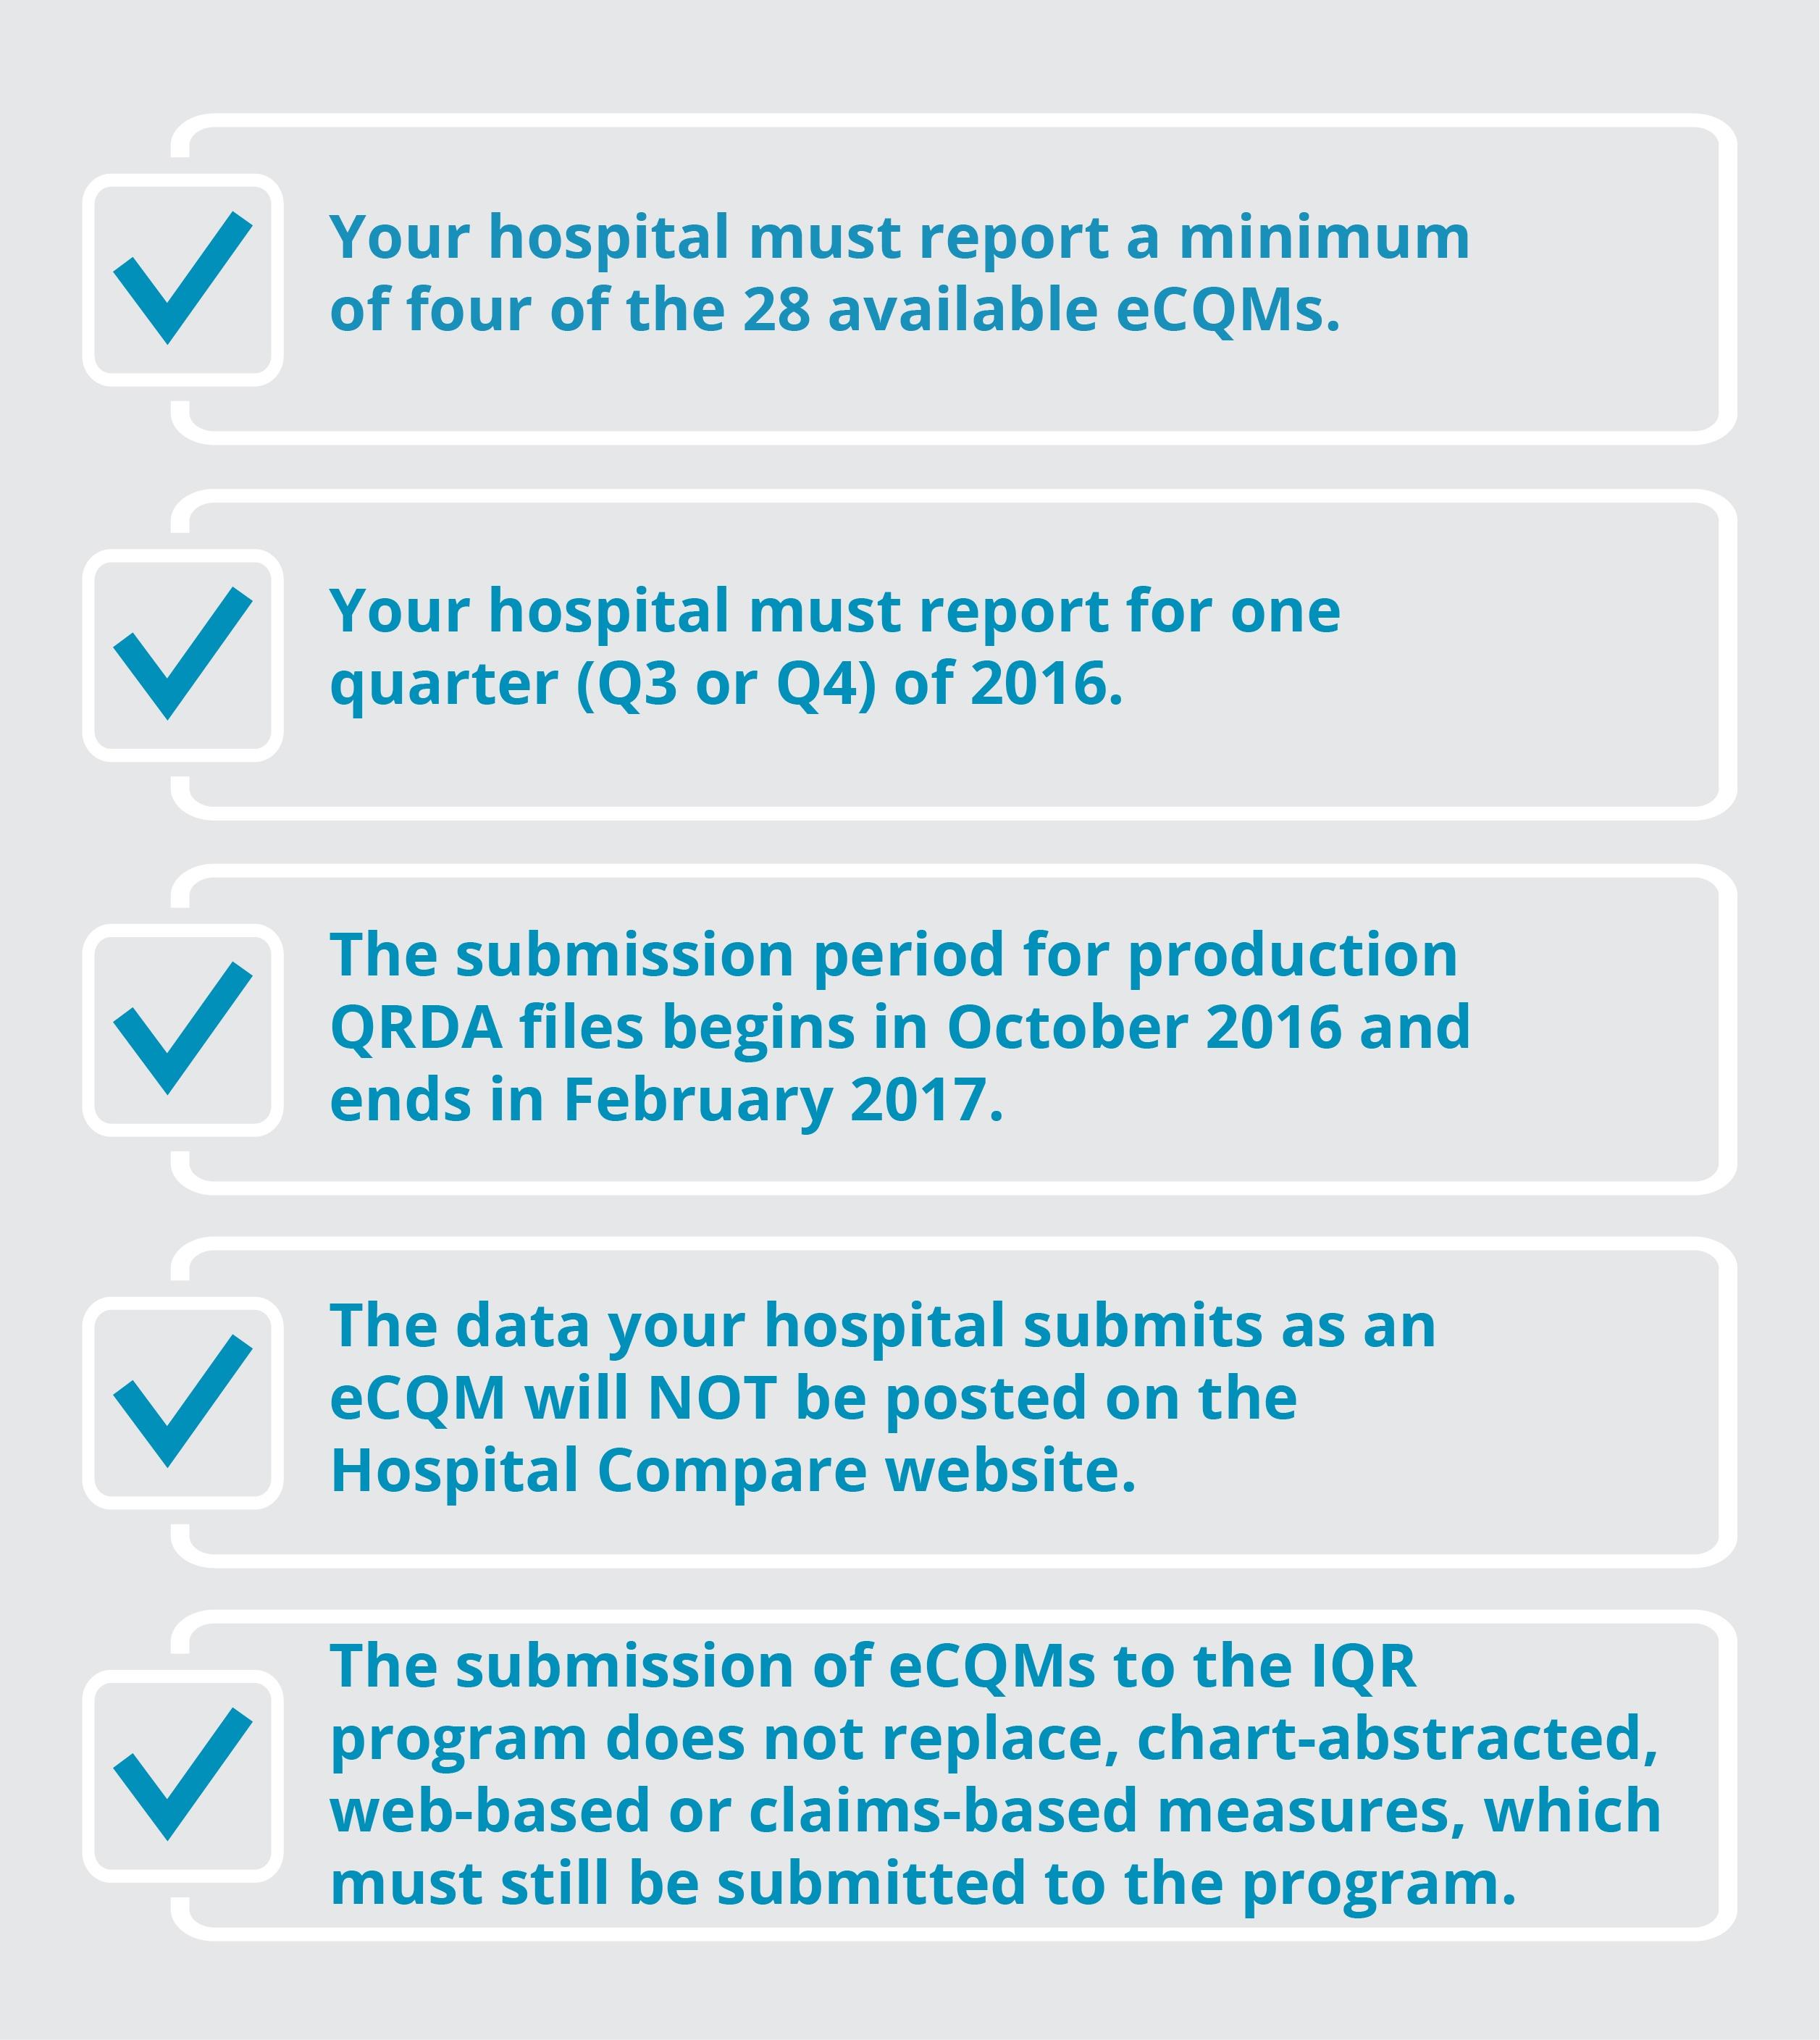 2016-IQR-eCQM-Requirements-01-1.jpg